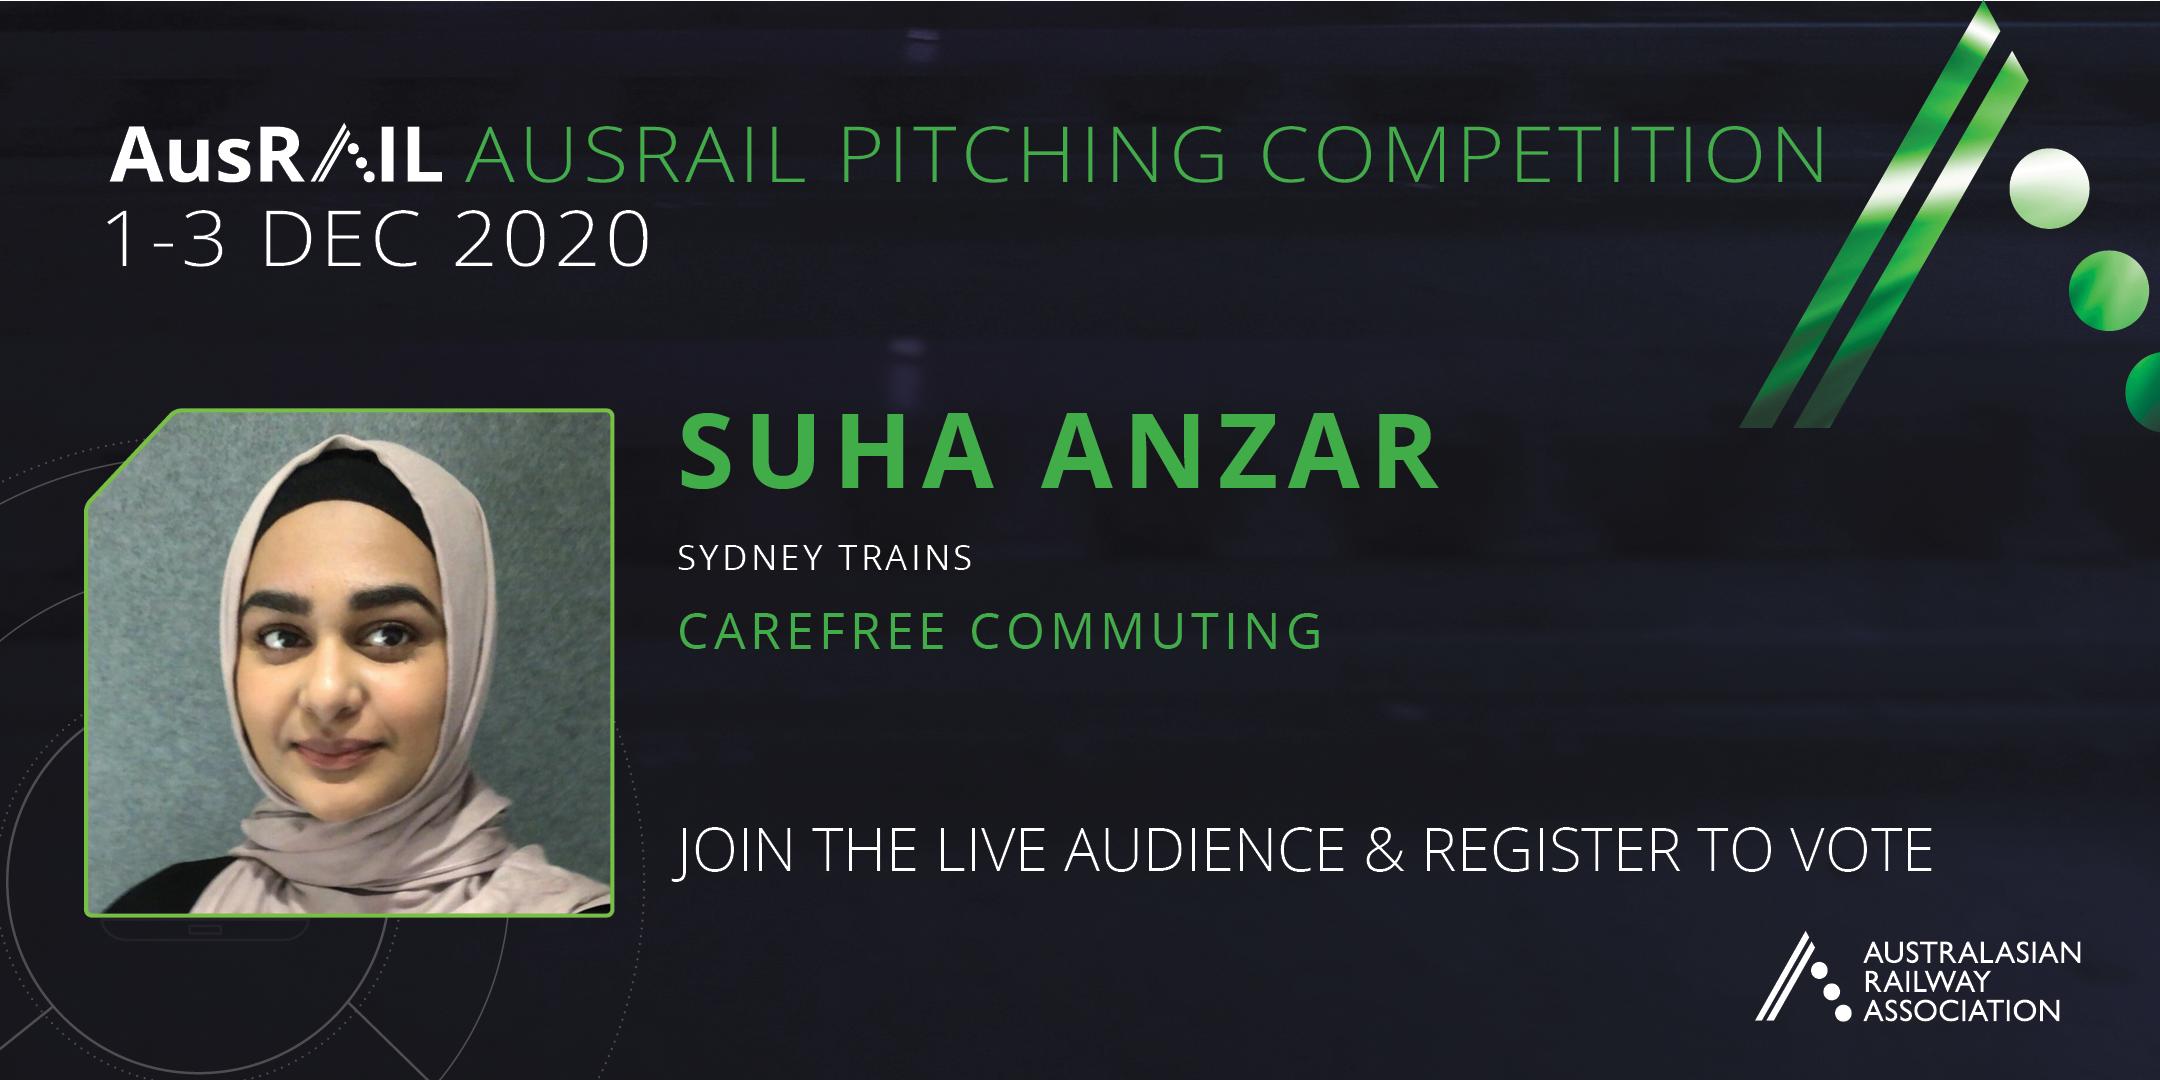 Suha Anzar